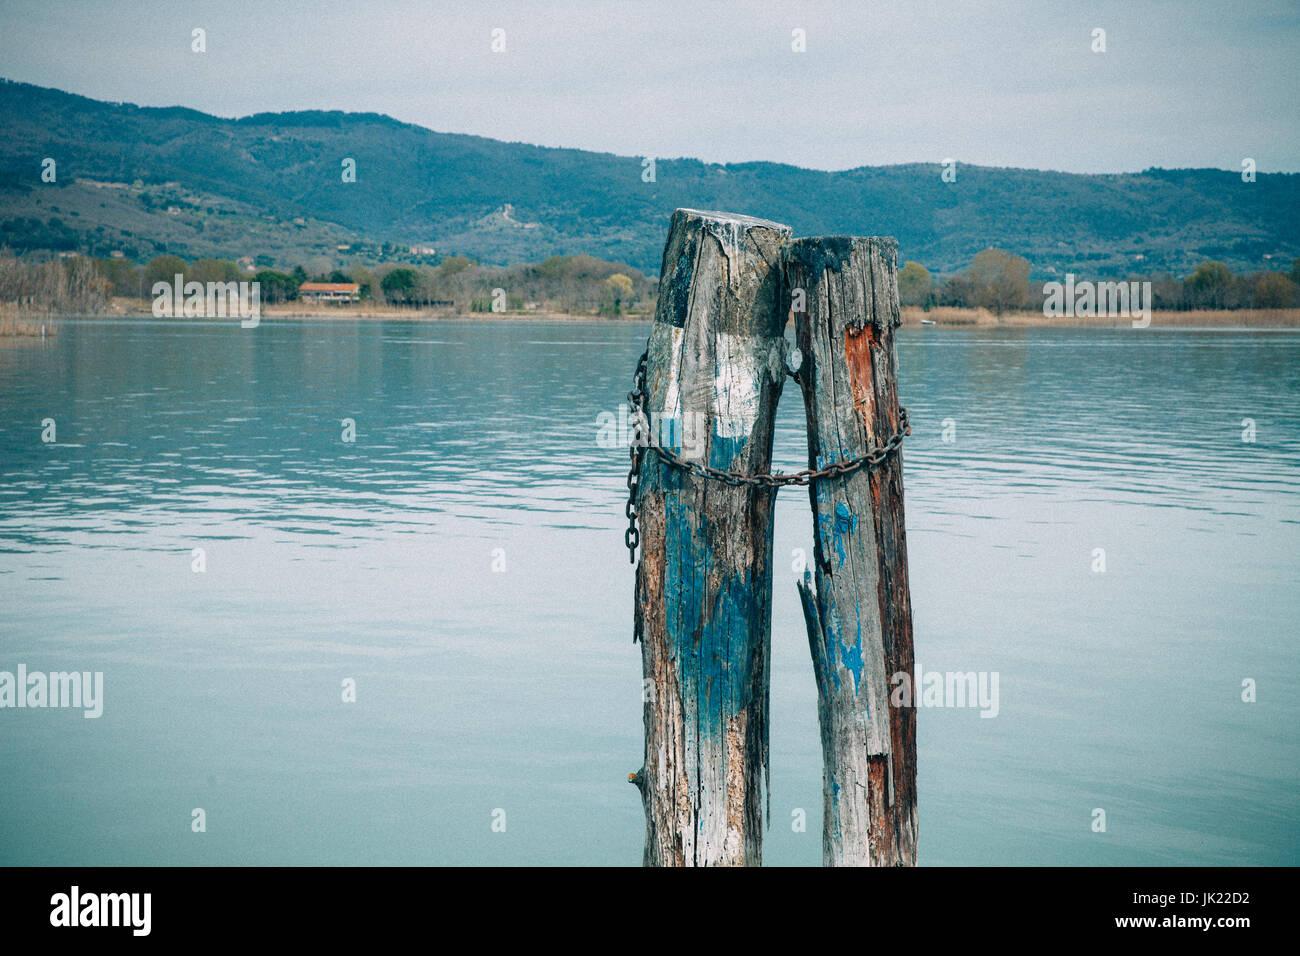 Wooden Pillars At The Lake Timeless Love Symbol Stock Photo